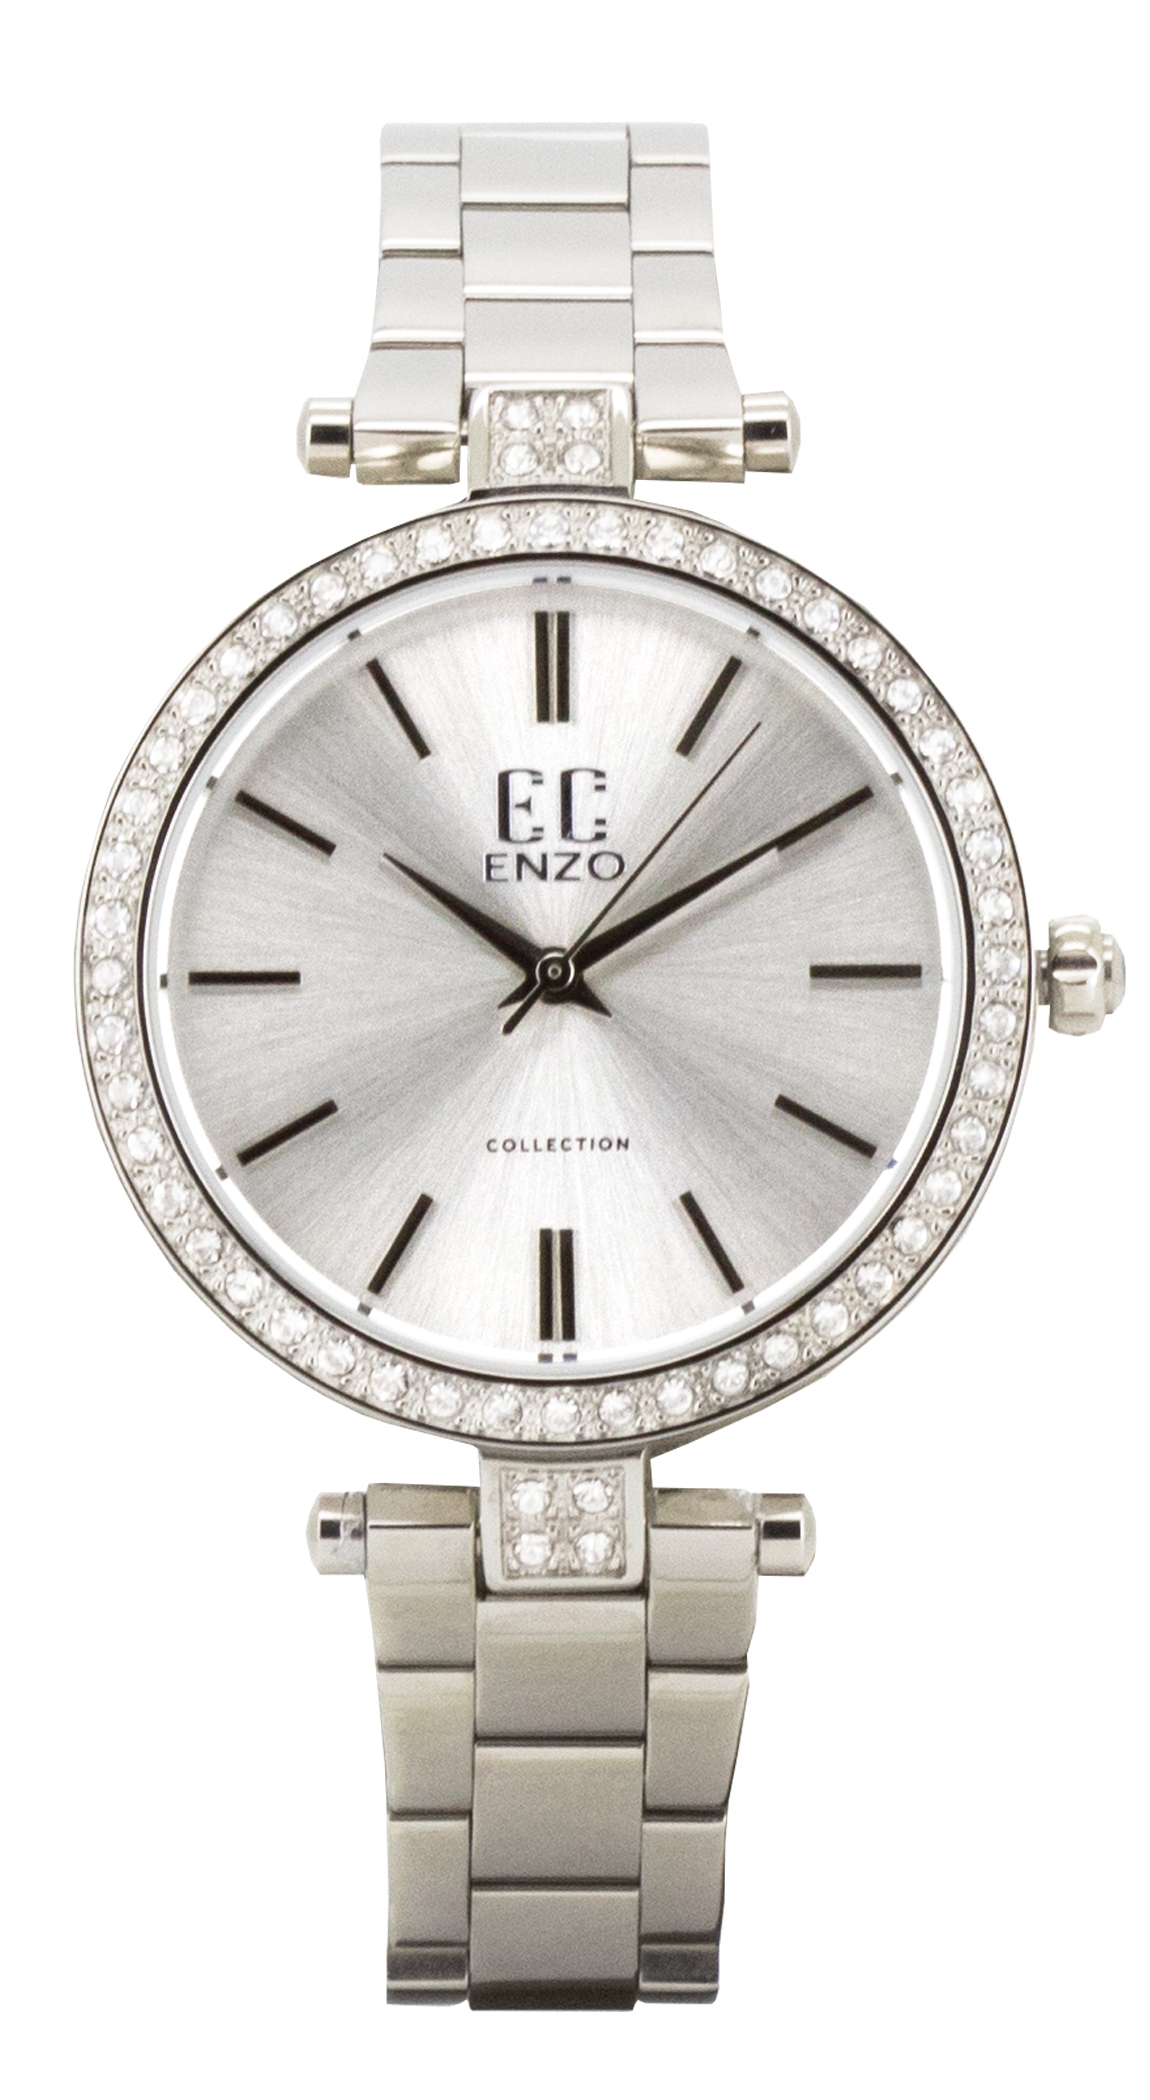 EC#1384# – Enzo Collection